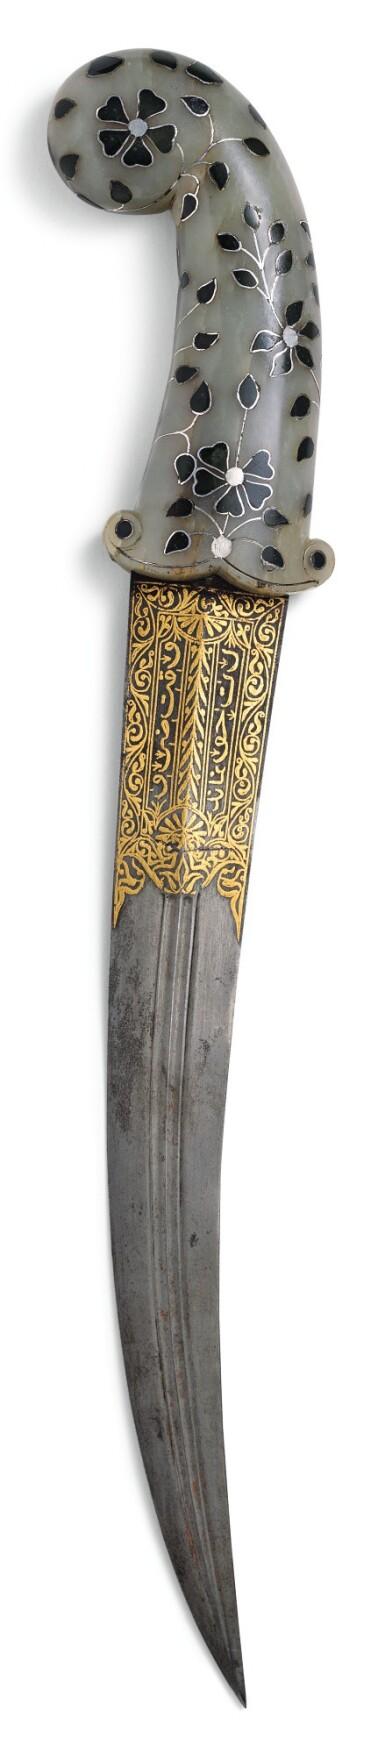 A MUHAL JADE AND SILVER-INLAID JADE-HILTED DAGGER (KHANJAR), INDIA, 18TH CENTURY